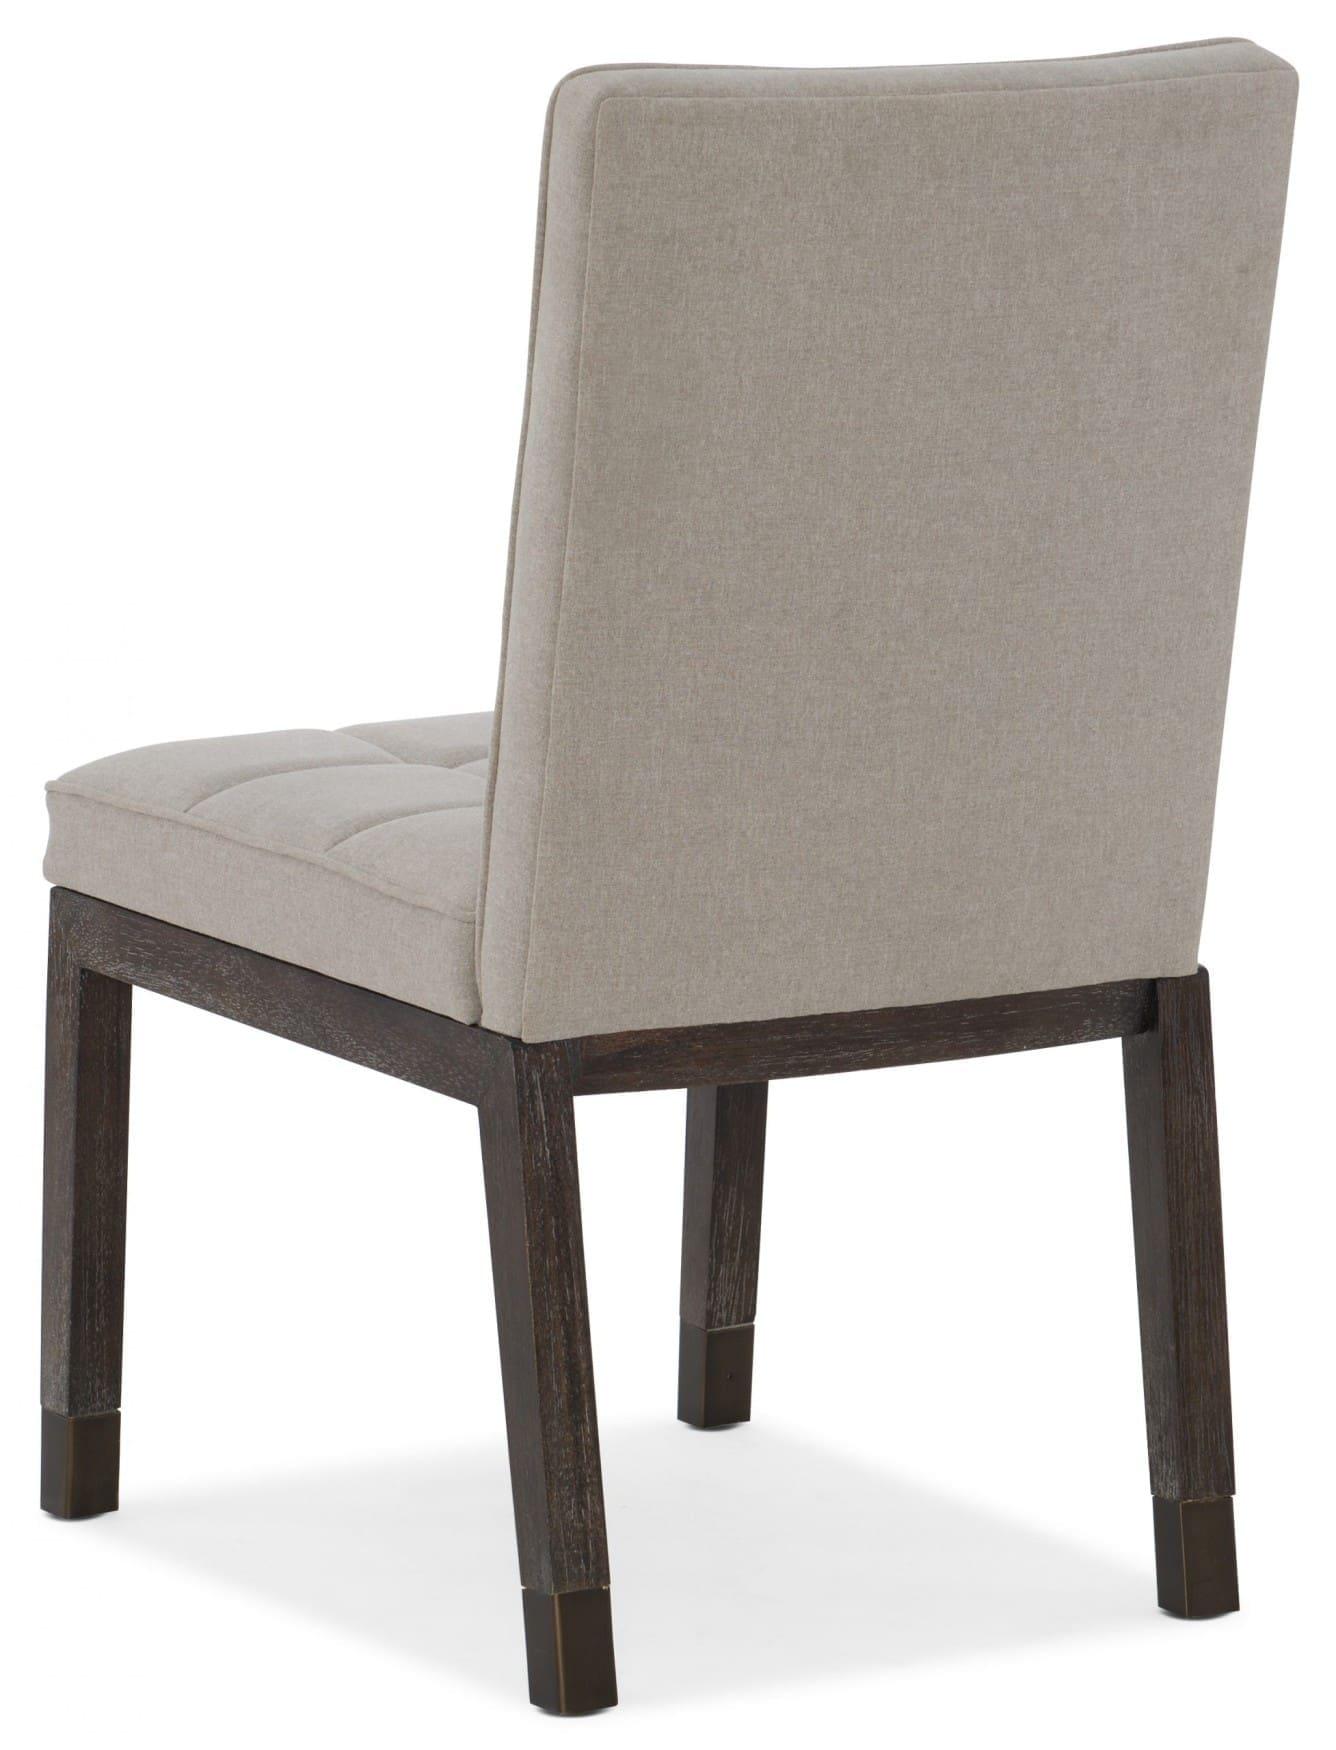 Miramar Aventura Cupertino Upholstered Side Chair - 2 per carton/price ea